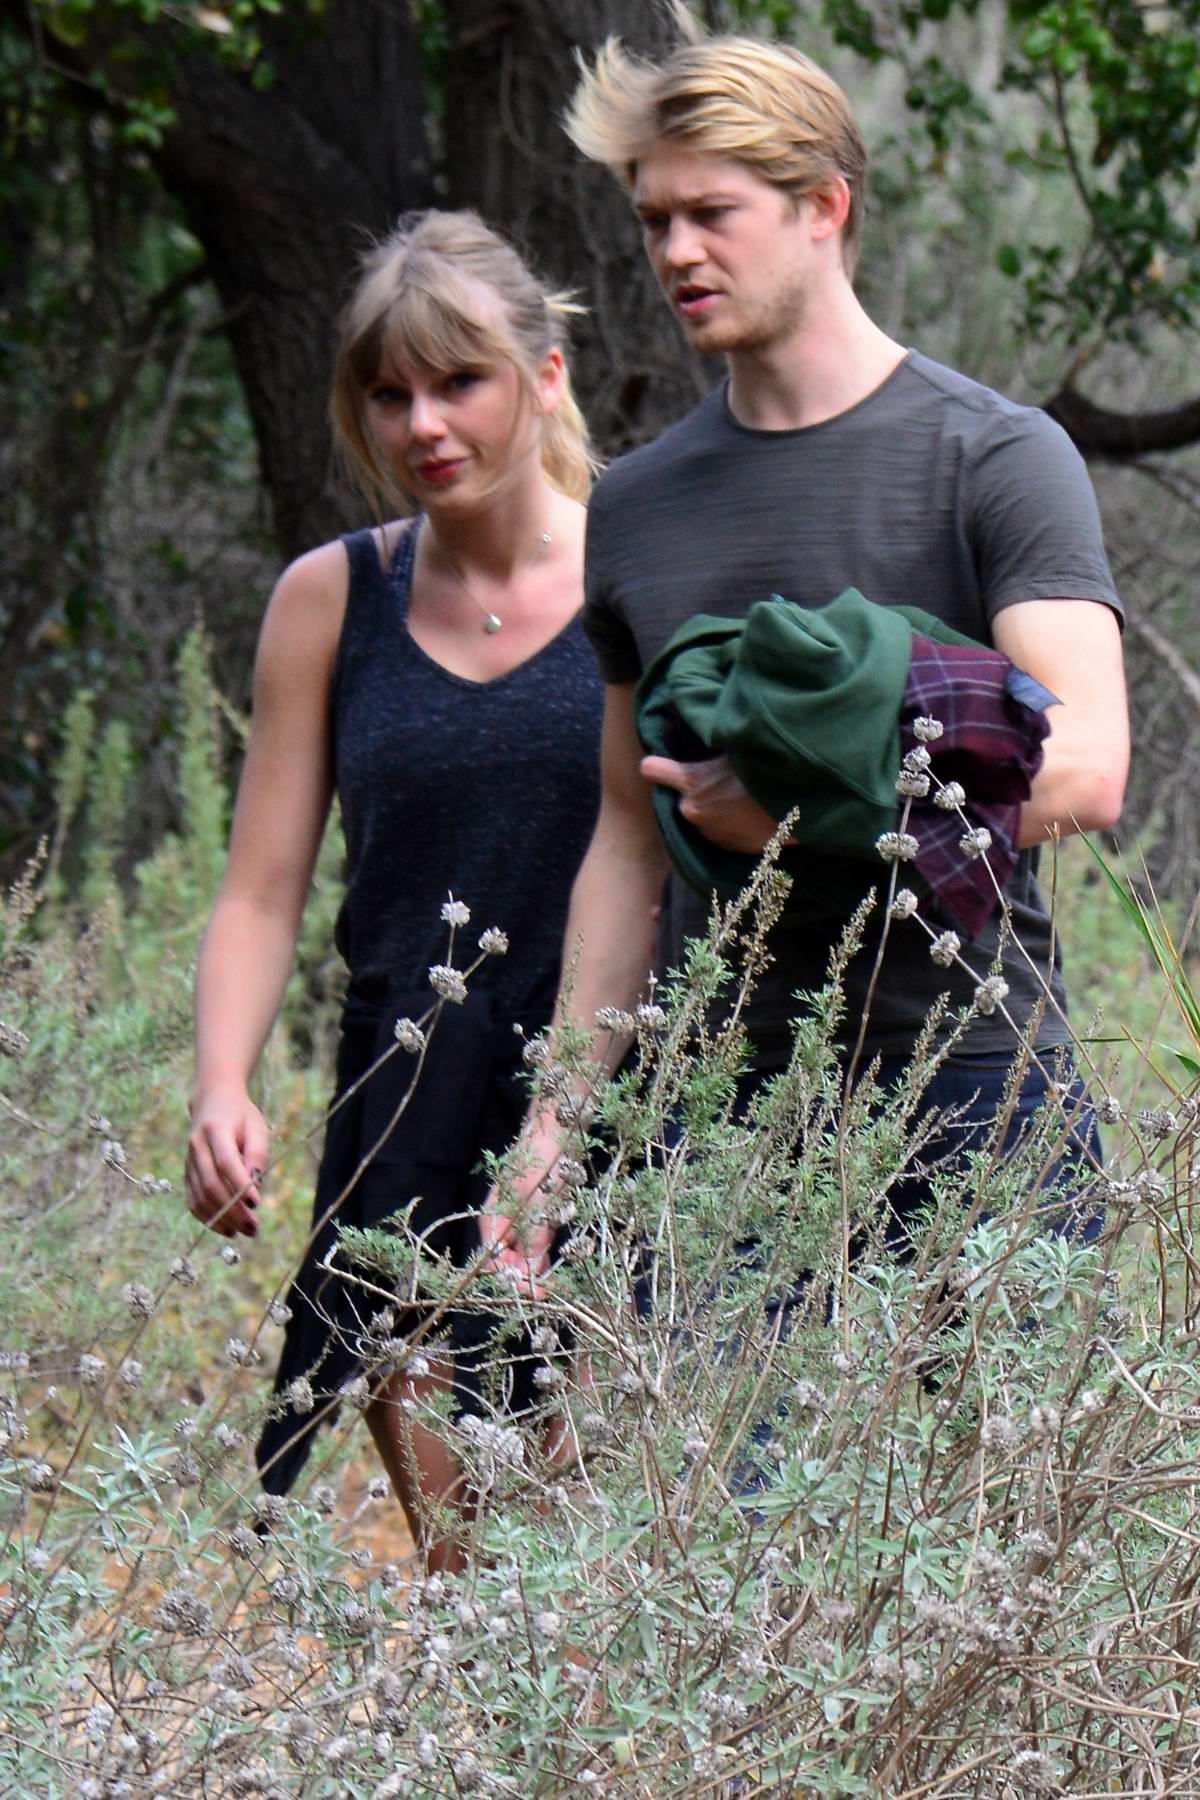 Taylor Swift and Joe Alwyn spotted while enjoying a hike in Malibu, California